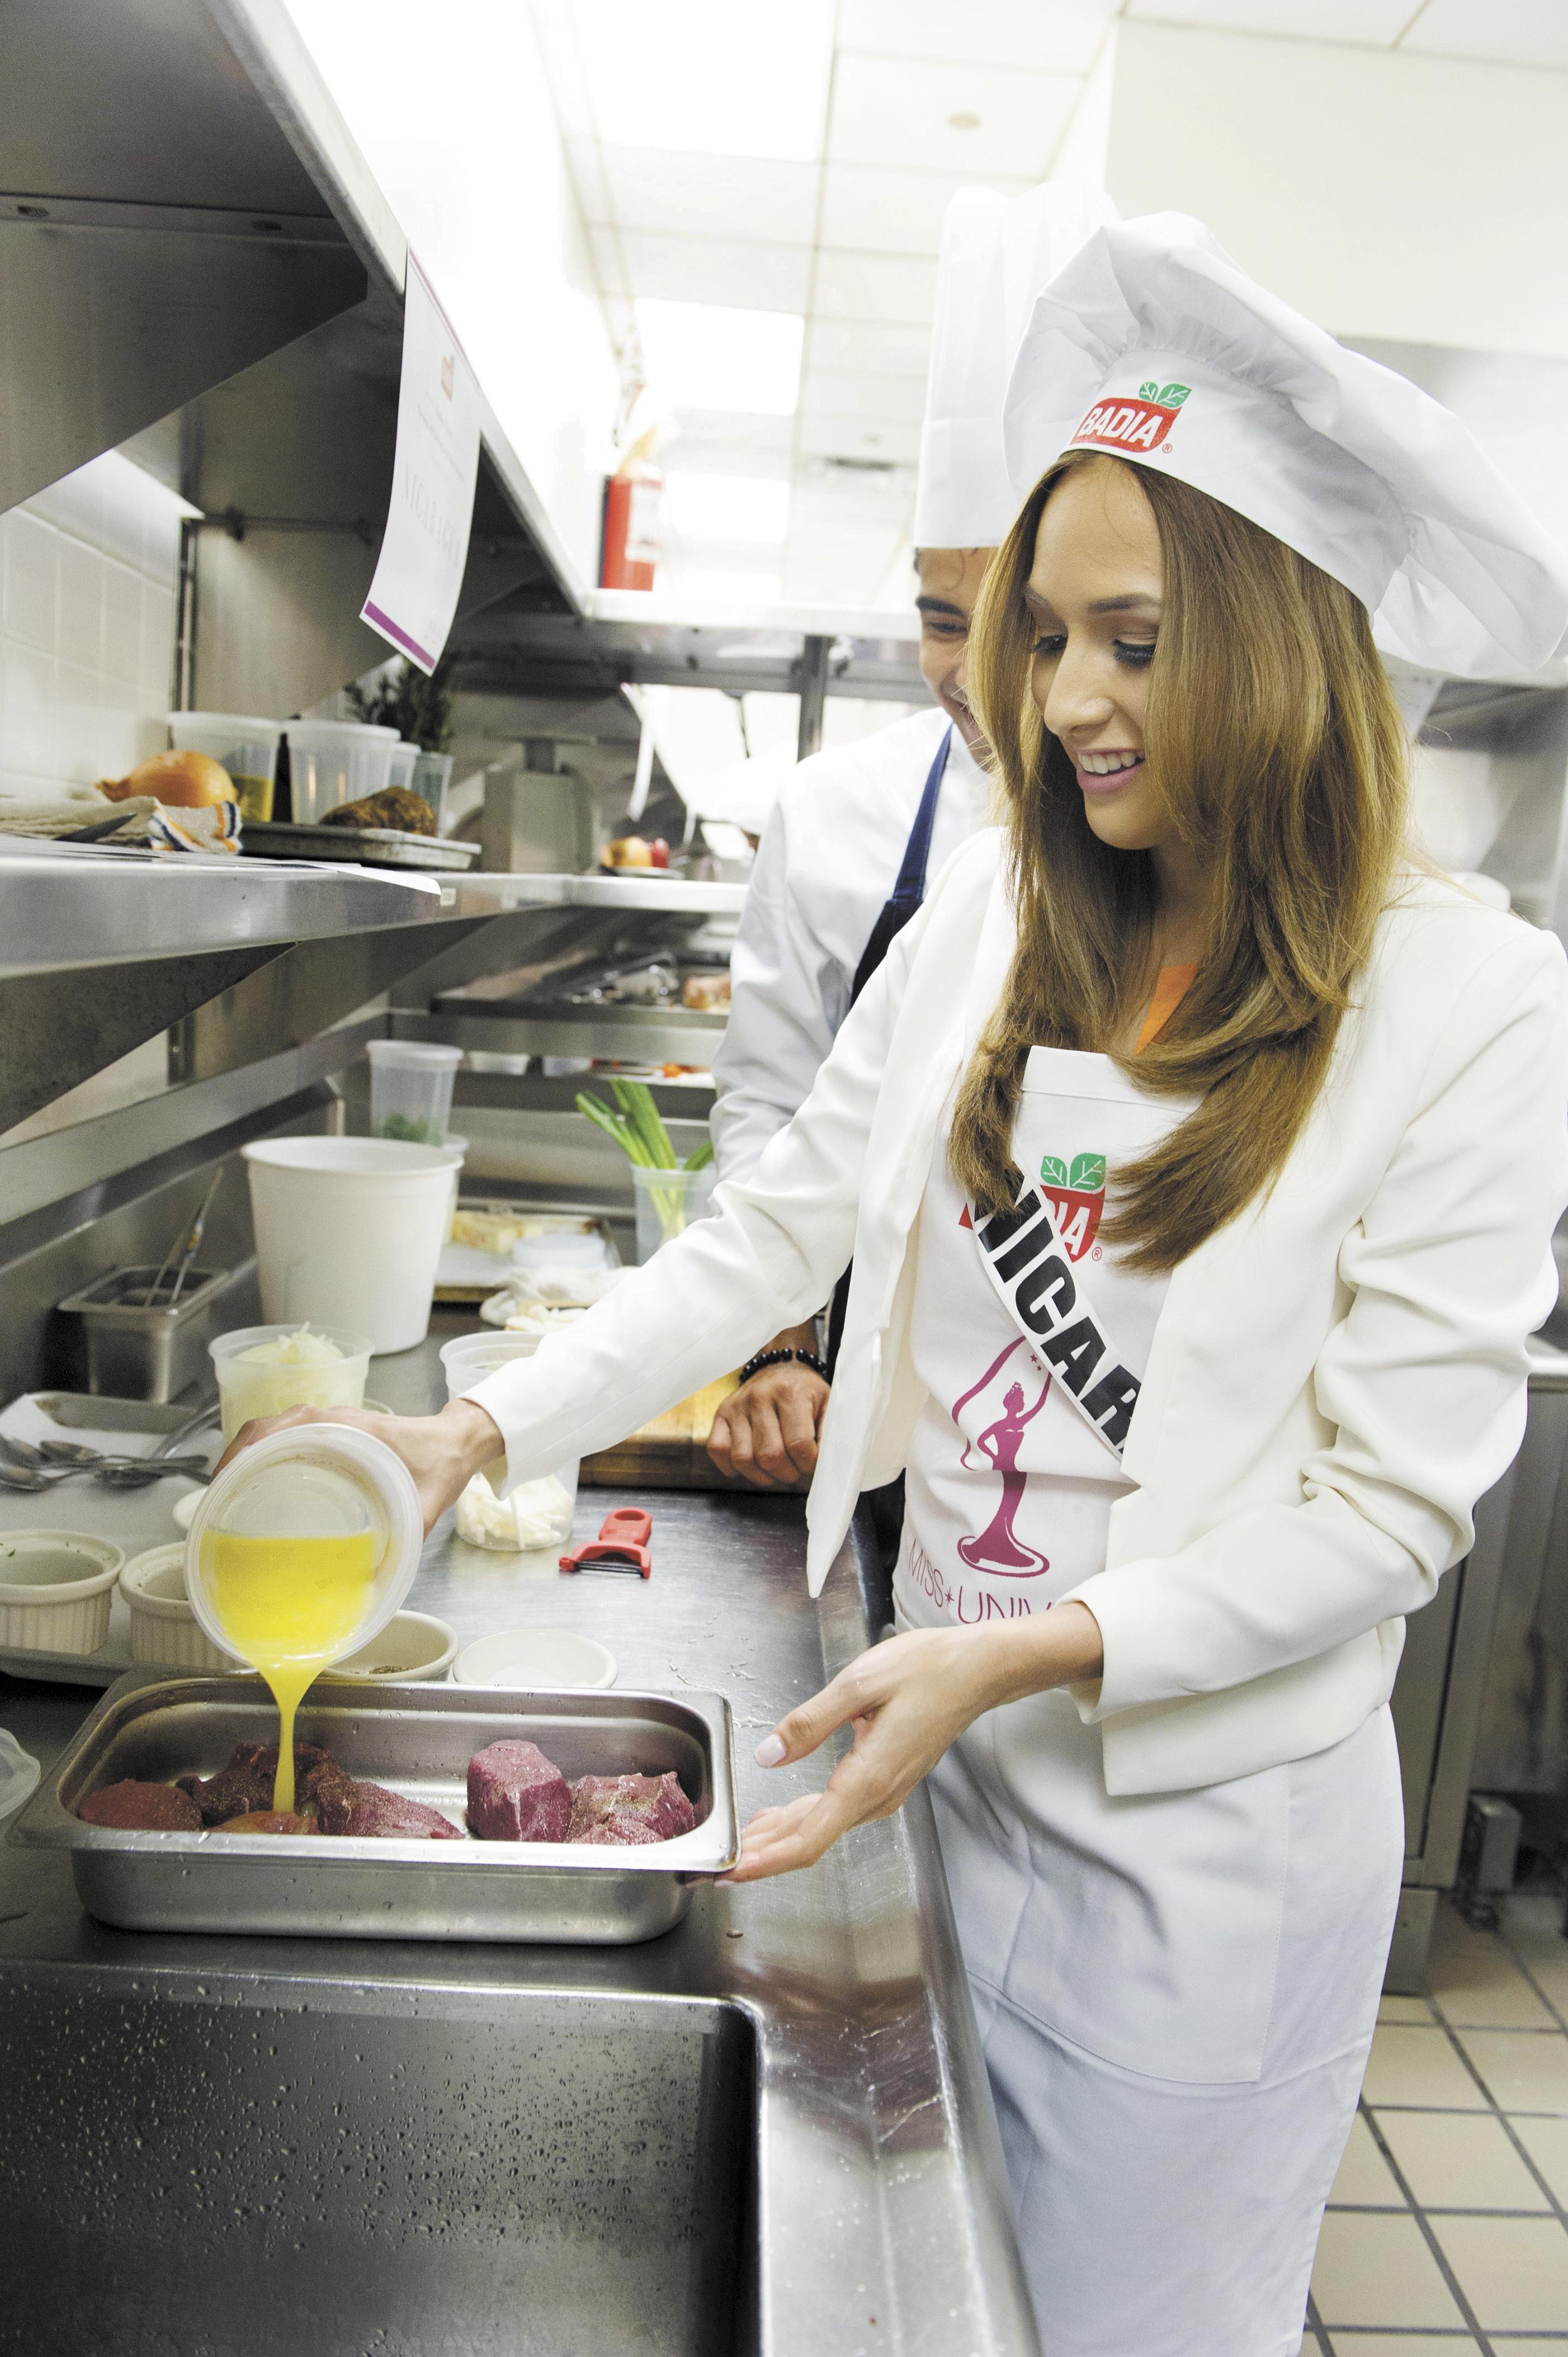 Marline barberena gana segundo lugar en concurso de cocina - Concurso de cocina ...